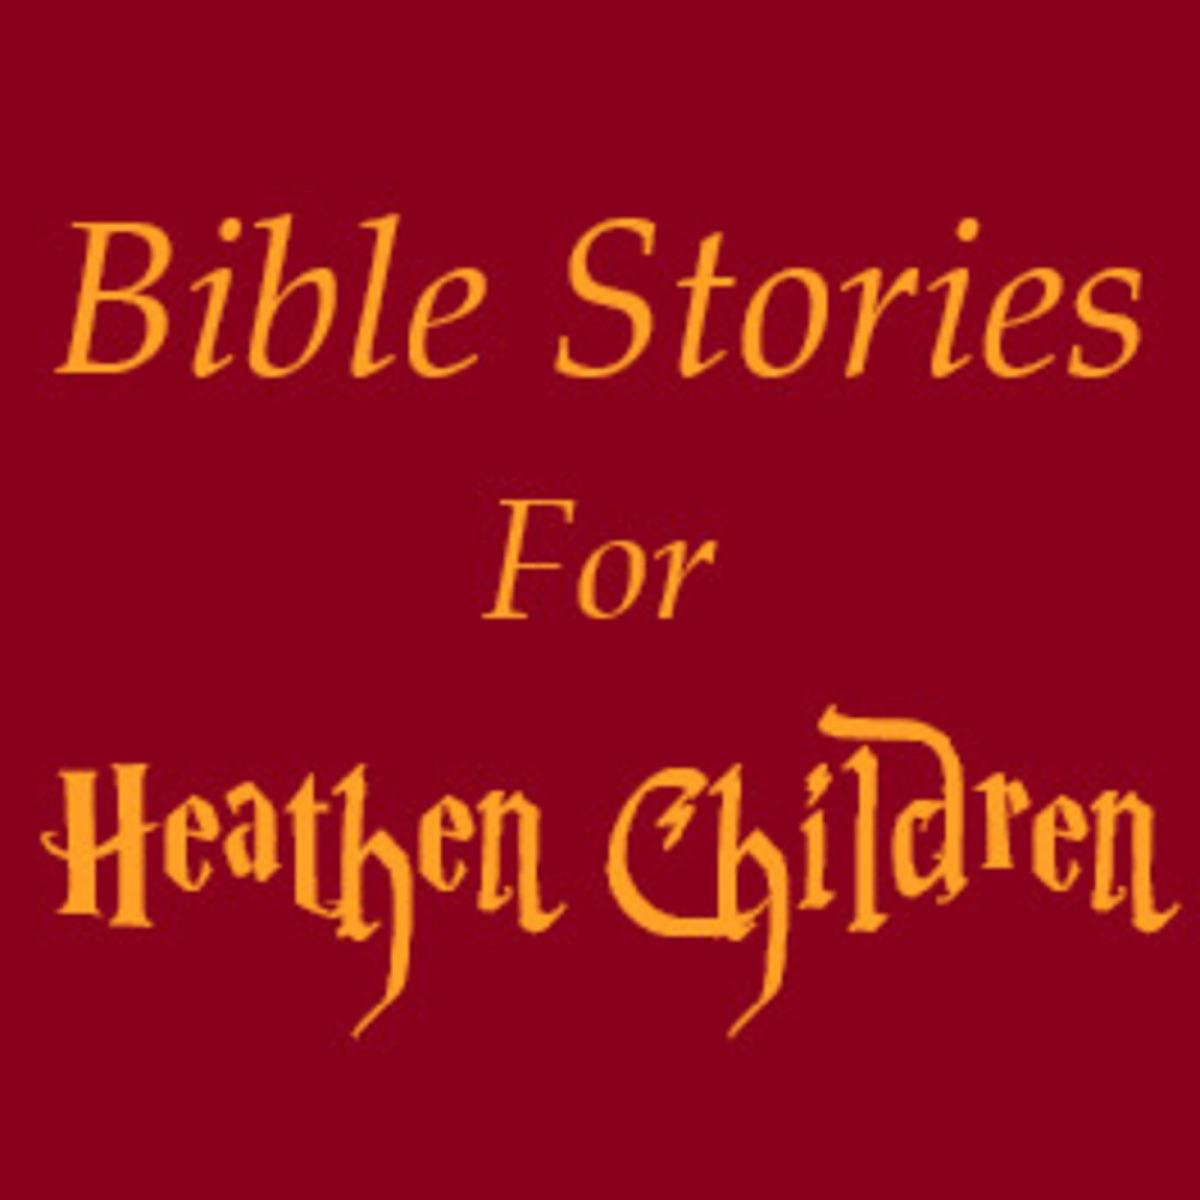 Bible Stories for Heathen Children